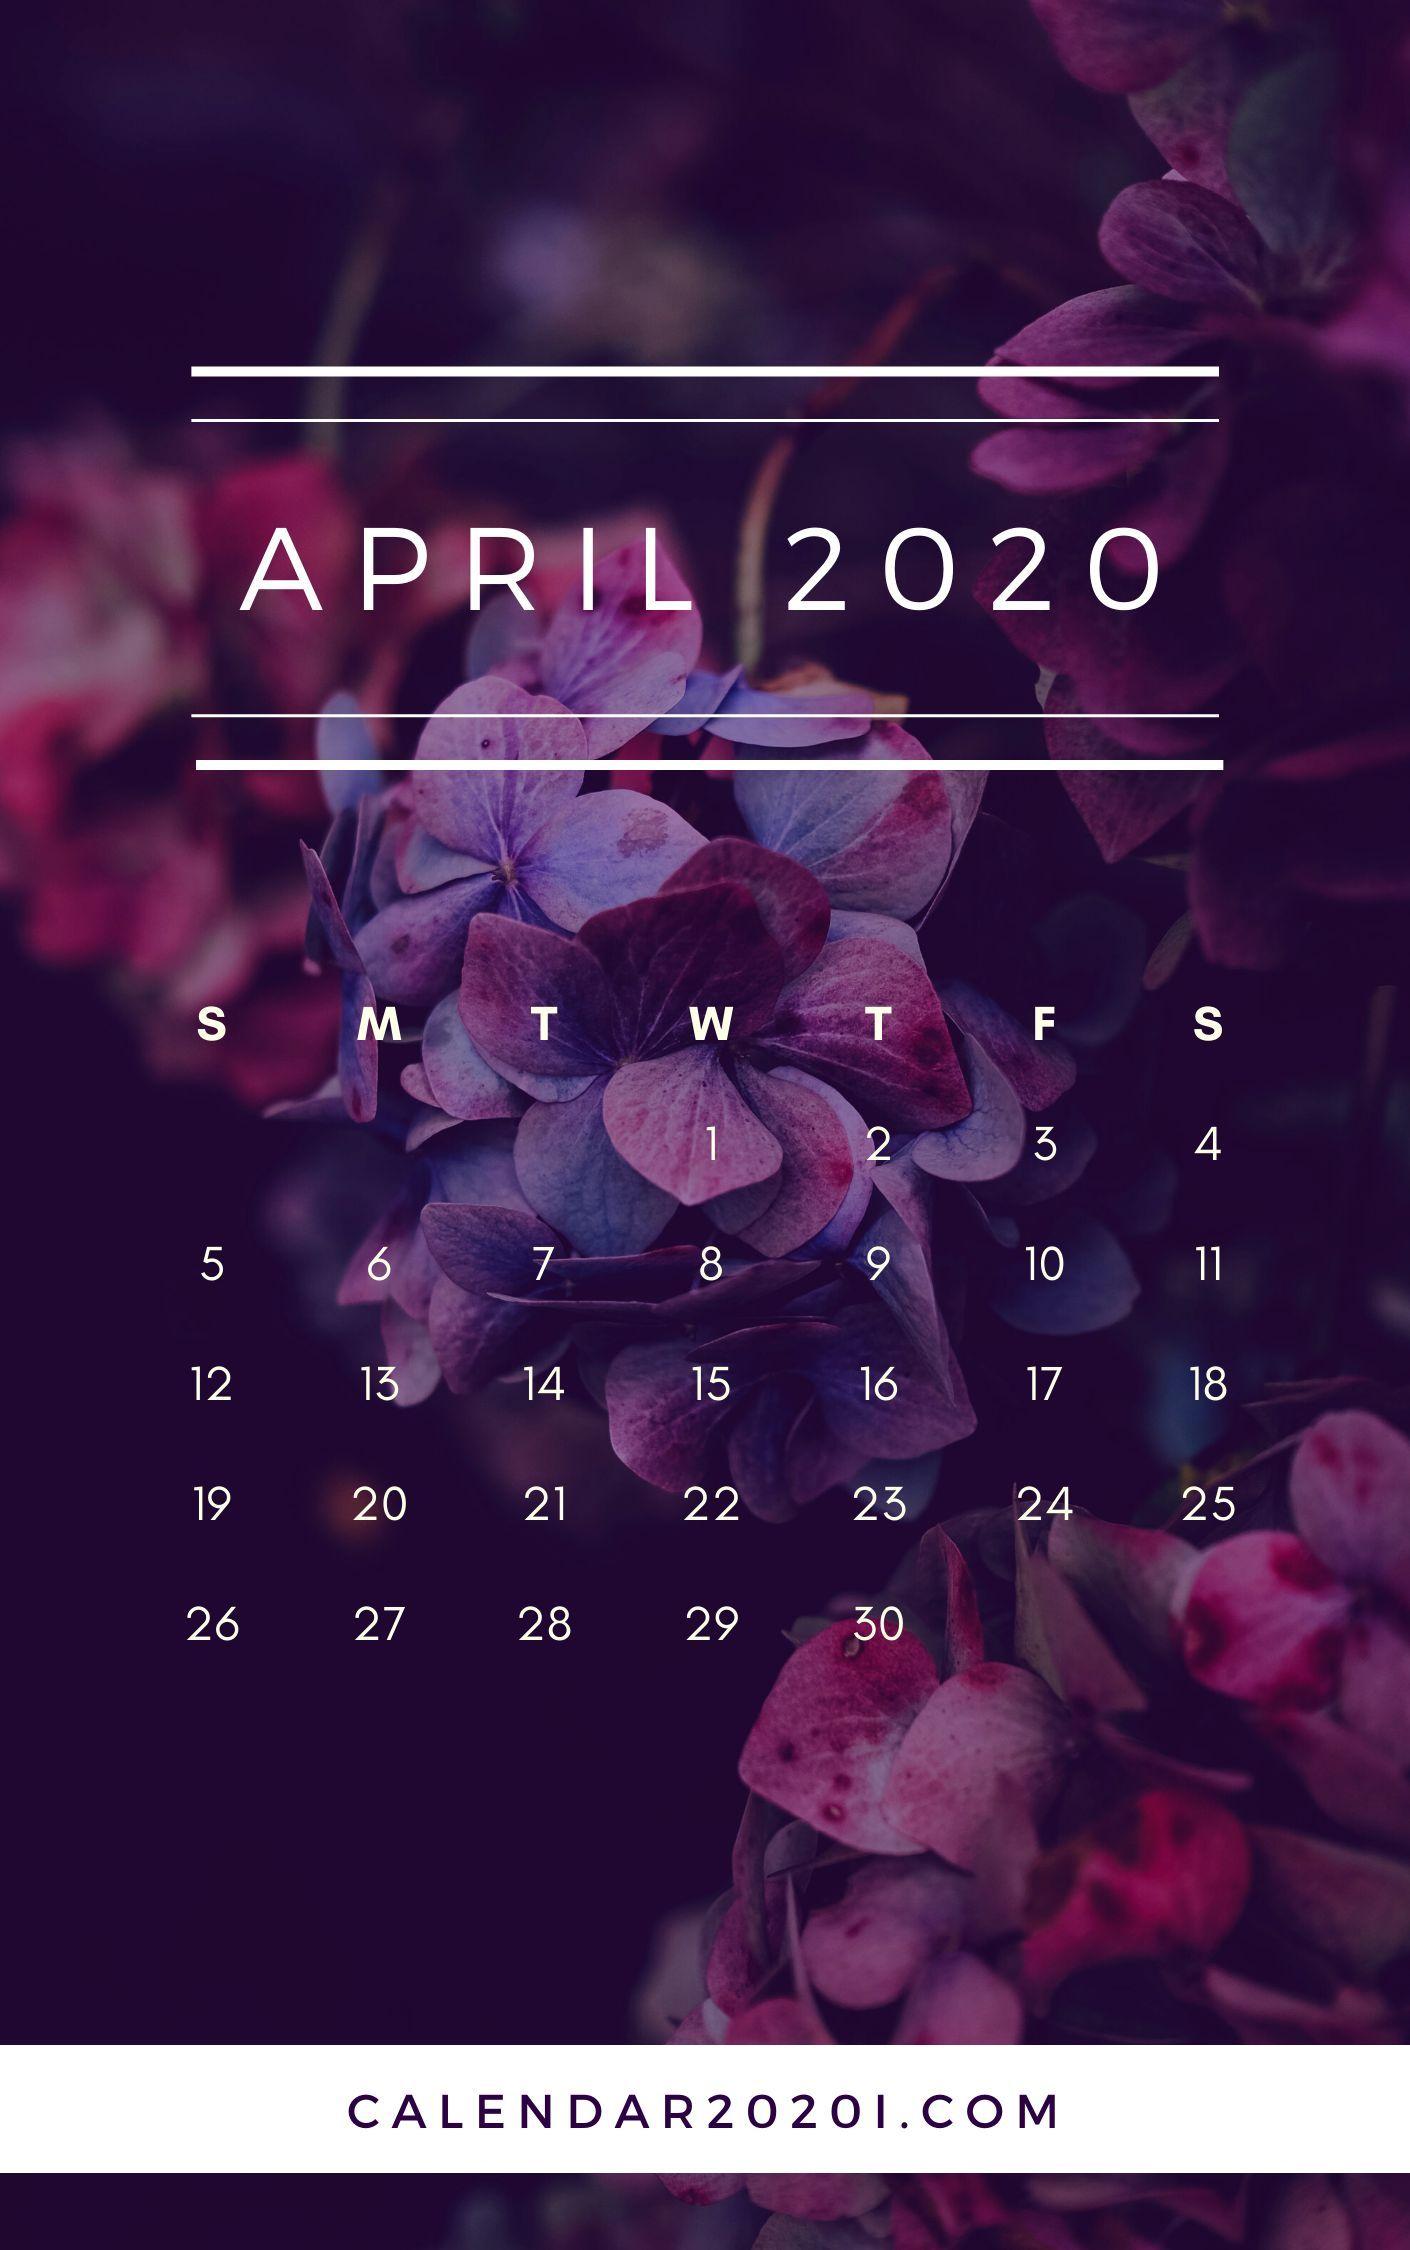 April 2020 Floral Calendar Printable Calendar 2020 in